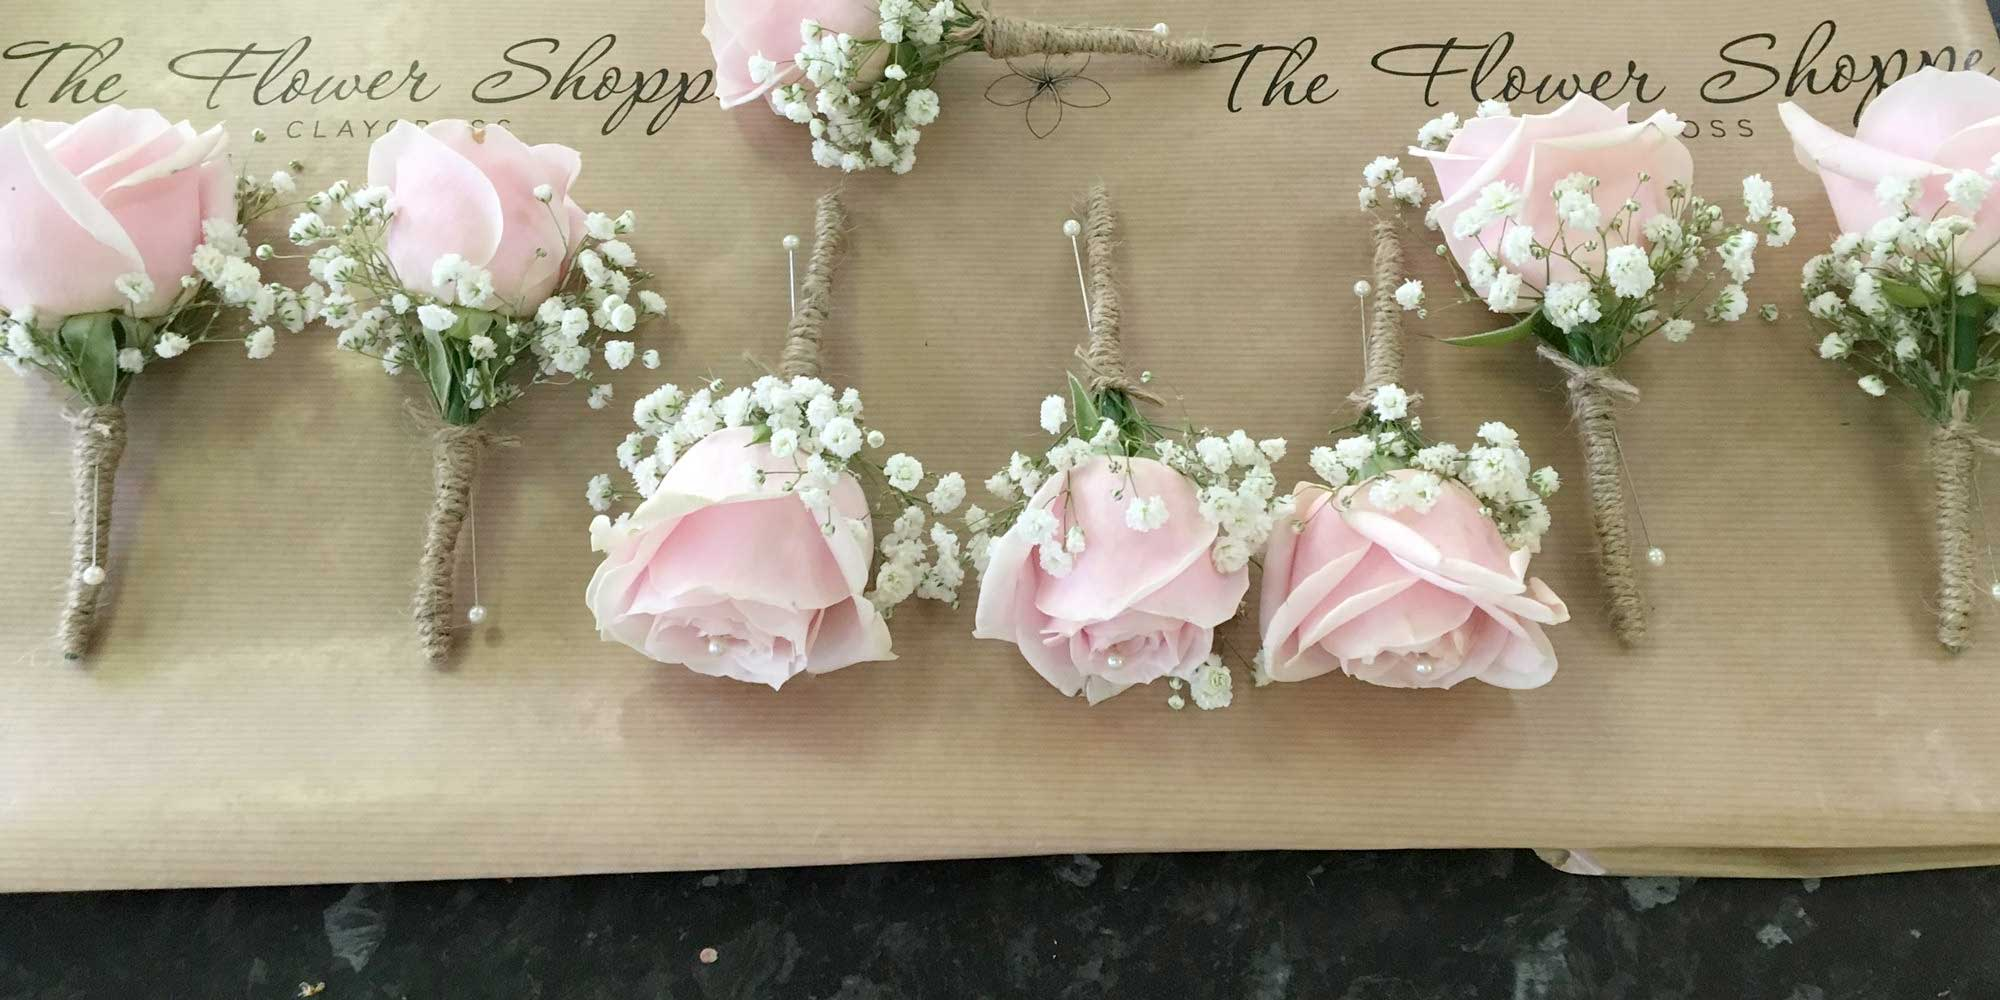 Clay cross flower shop florist chesterfield 01246 865296 welcome to clay cross flower shop florist chesterfield 01246 865296 izmirmasajfo